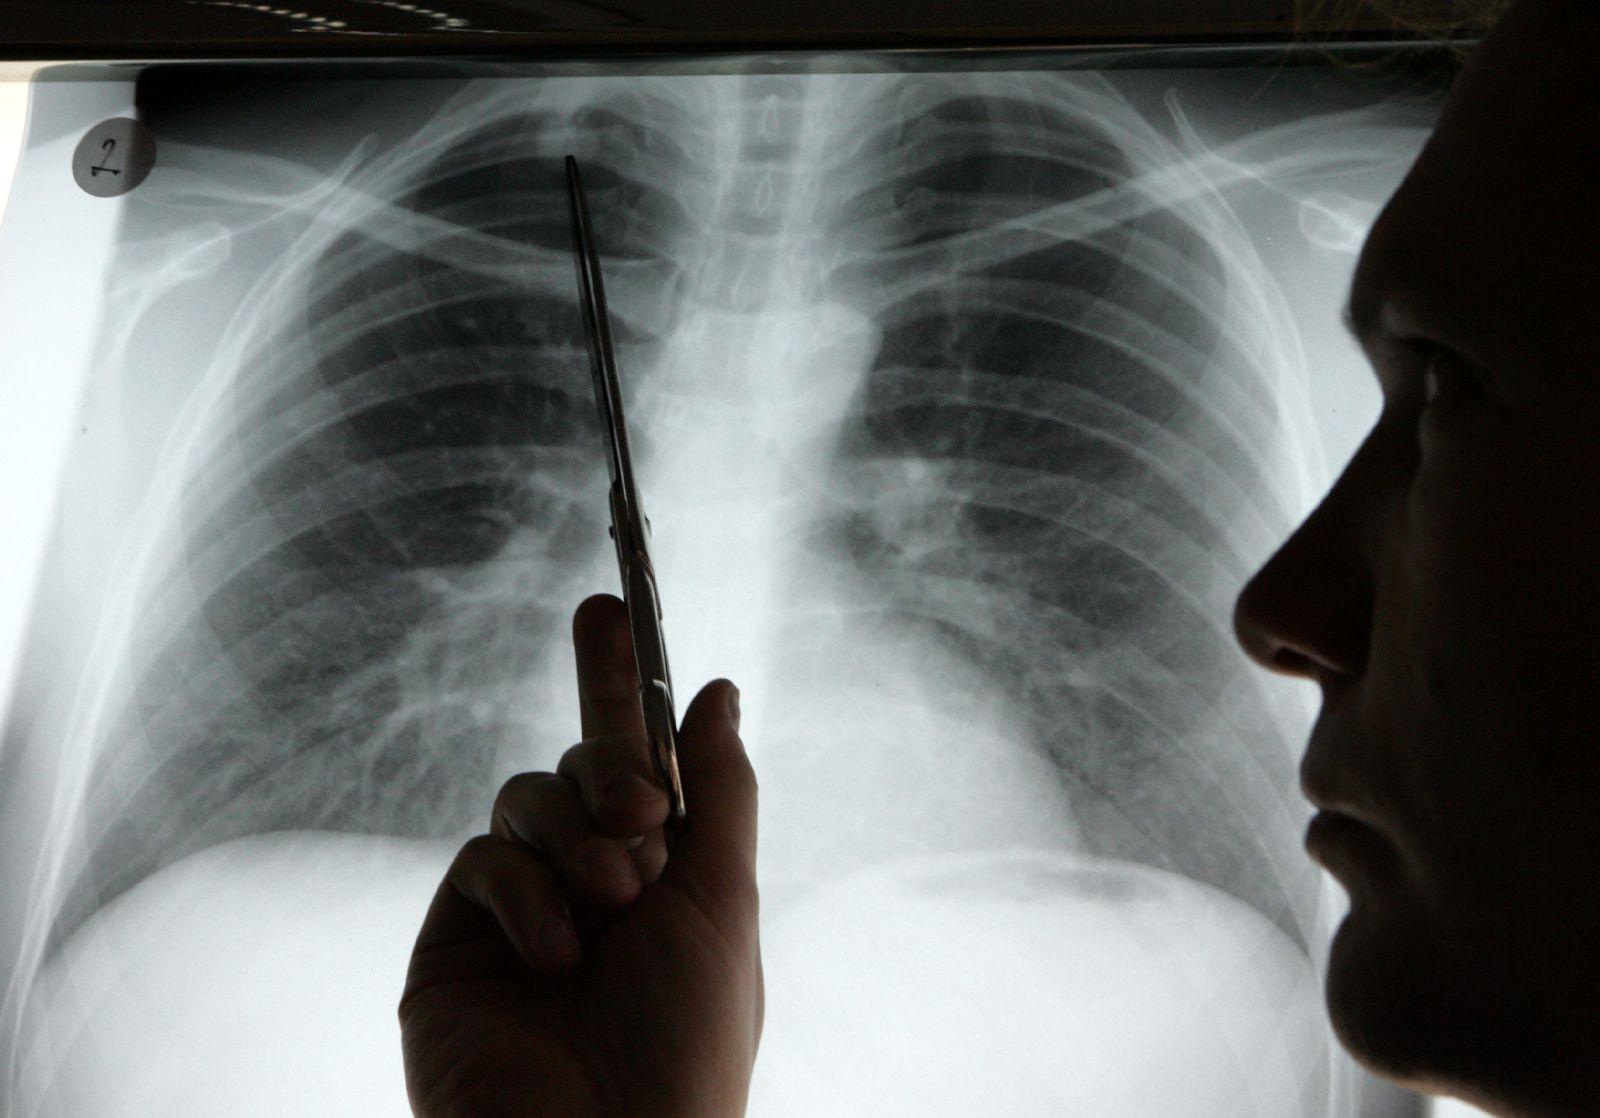 Diognose Lungenkrebs